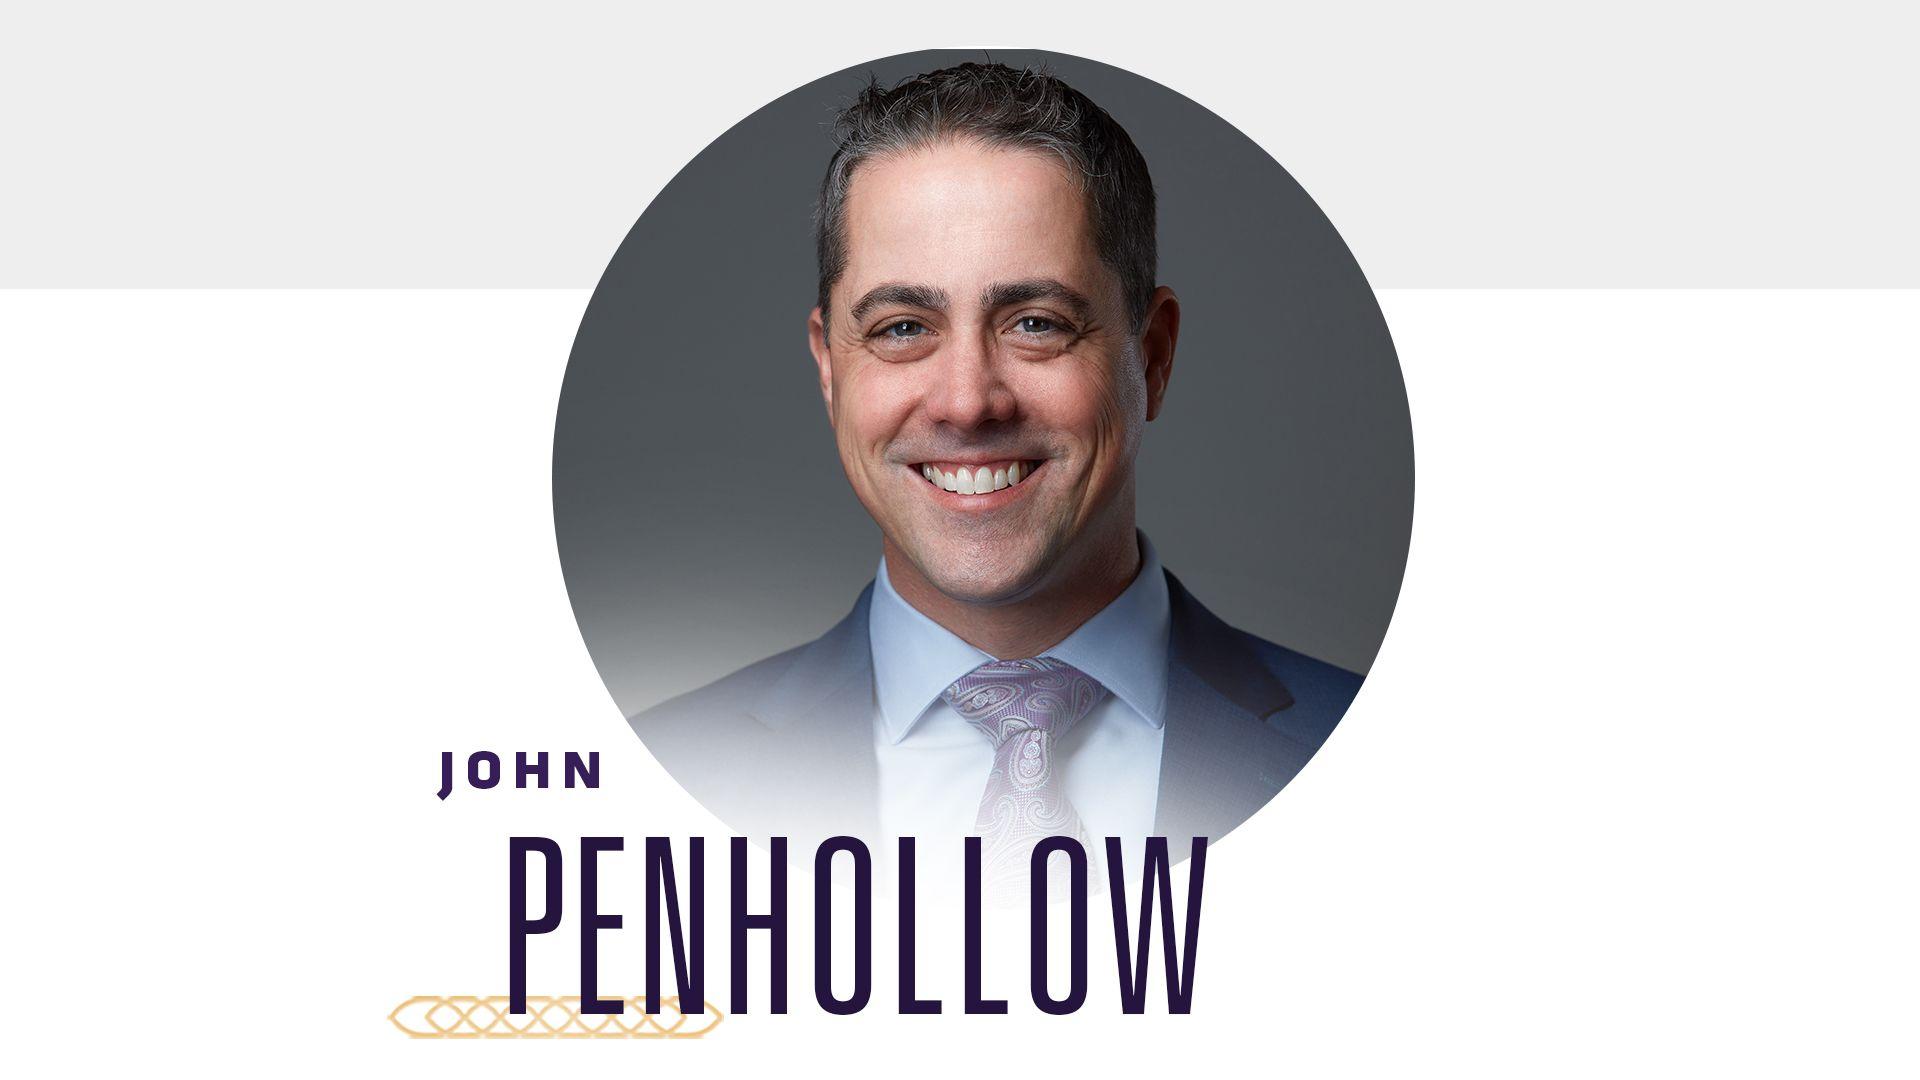 John Penhollow: Executive Vice President & Chief Revenue Officer, Minnesota Vikings